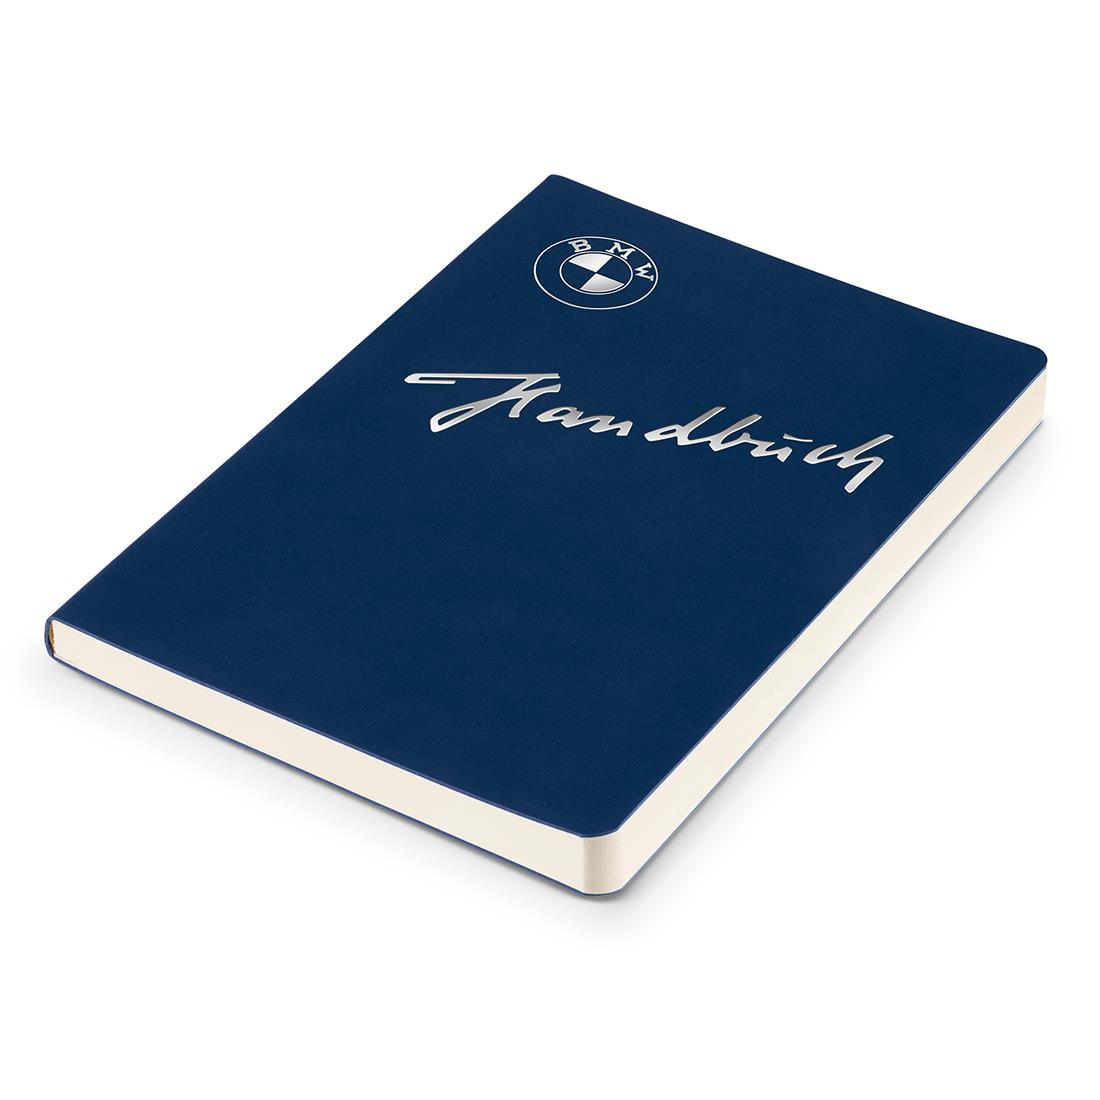 BMW Classic Notebook